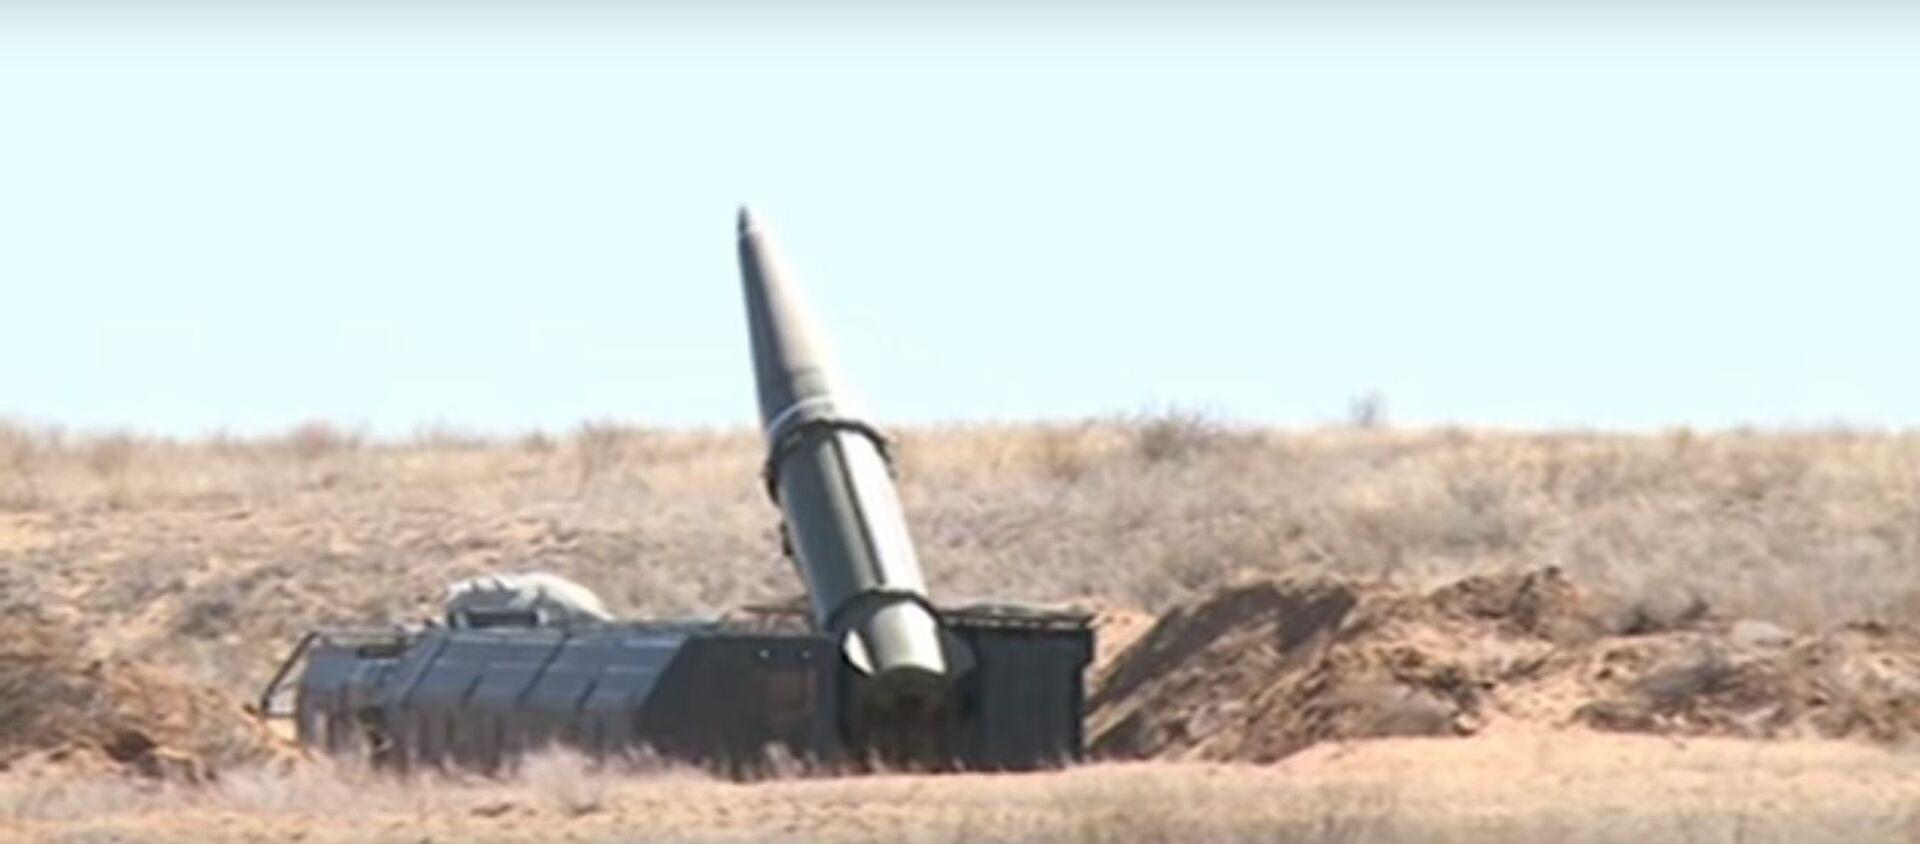 Пуск ракеты Искандер - Sputnik Таджикистан, 1920, 01.09.2019